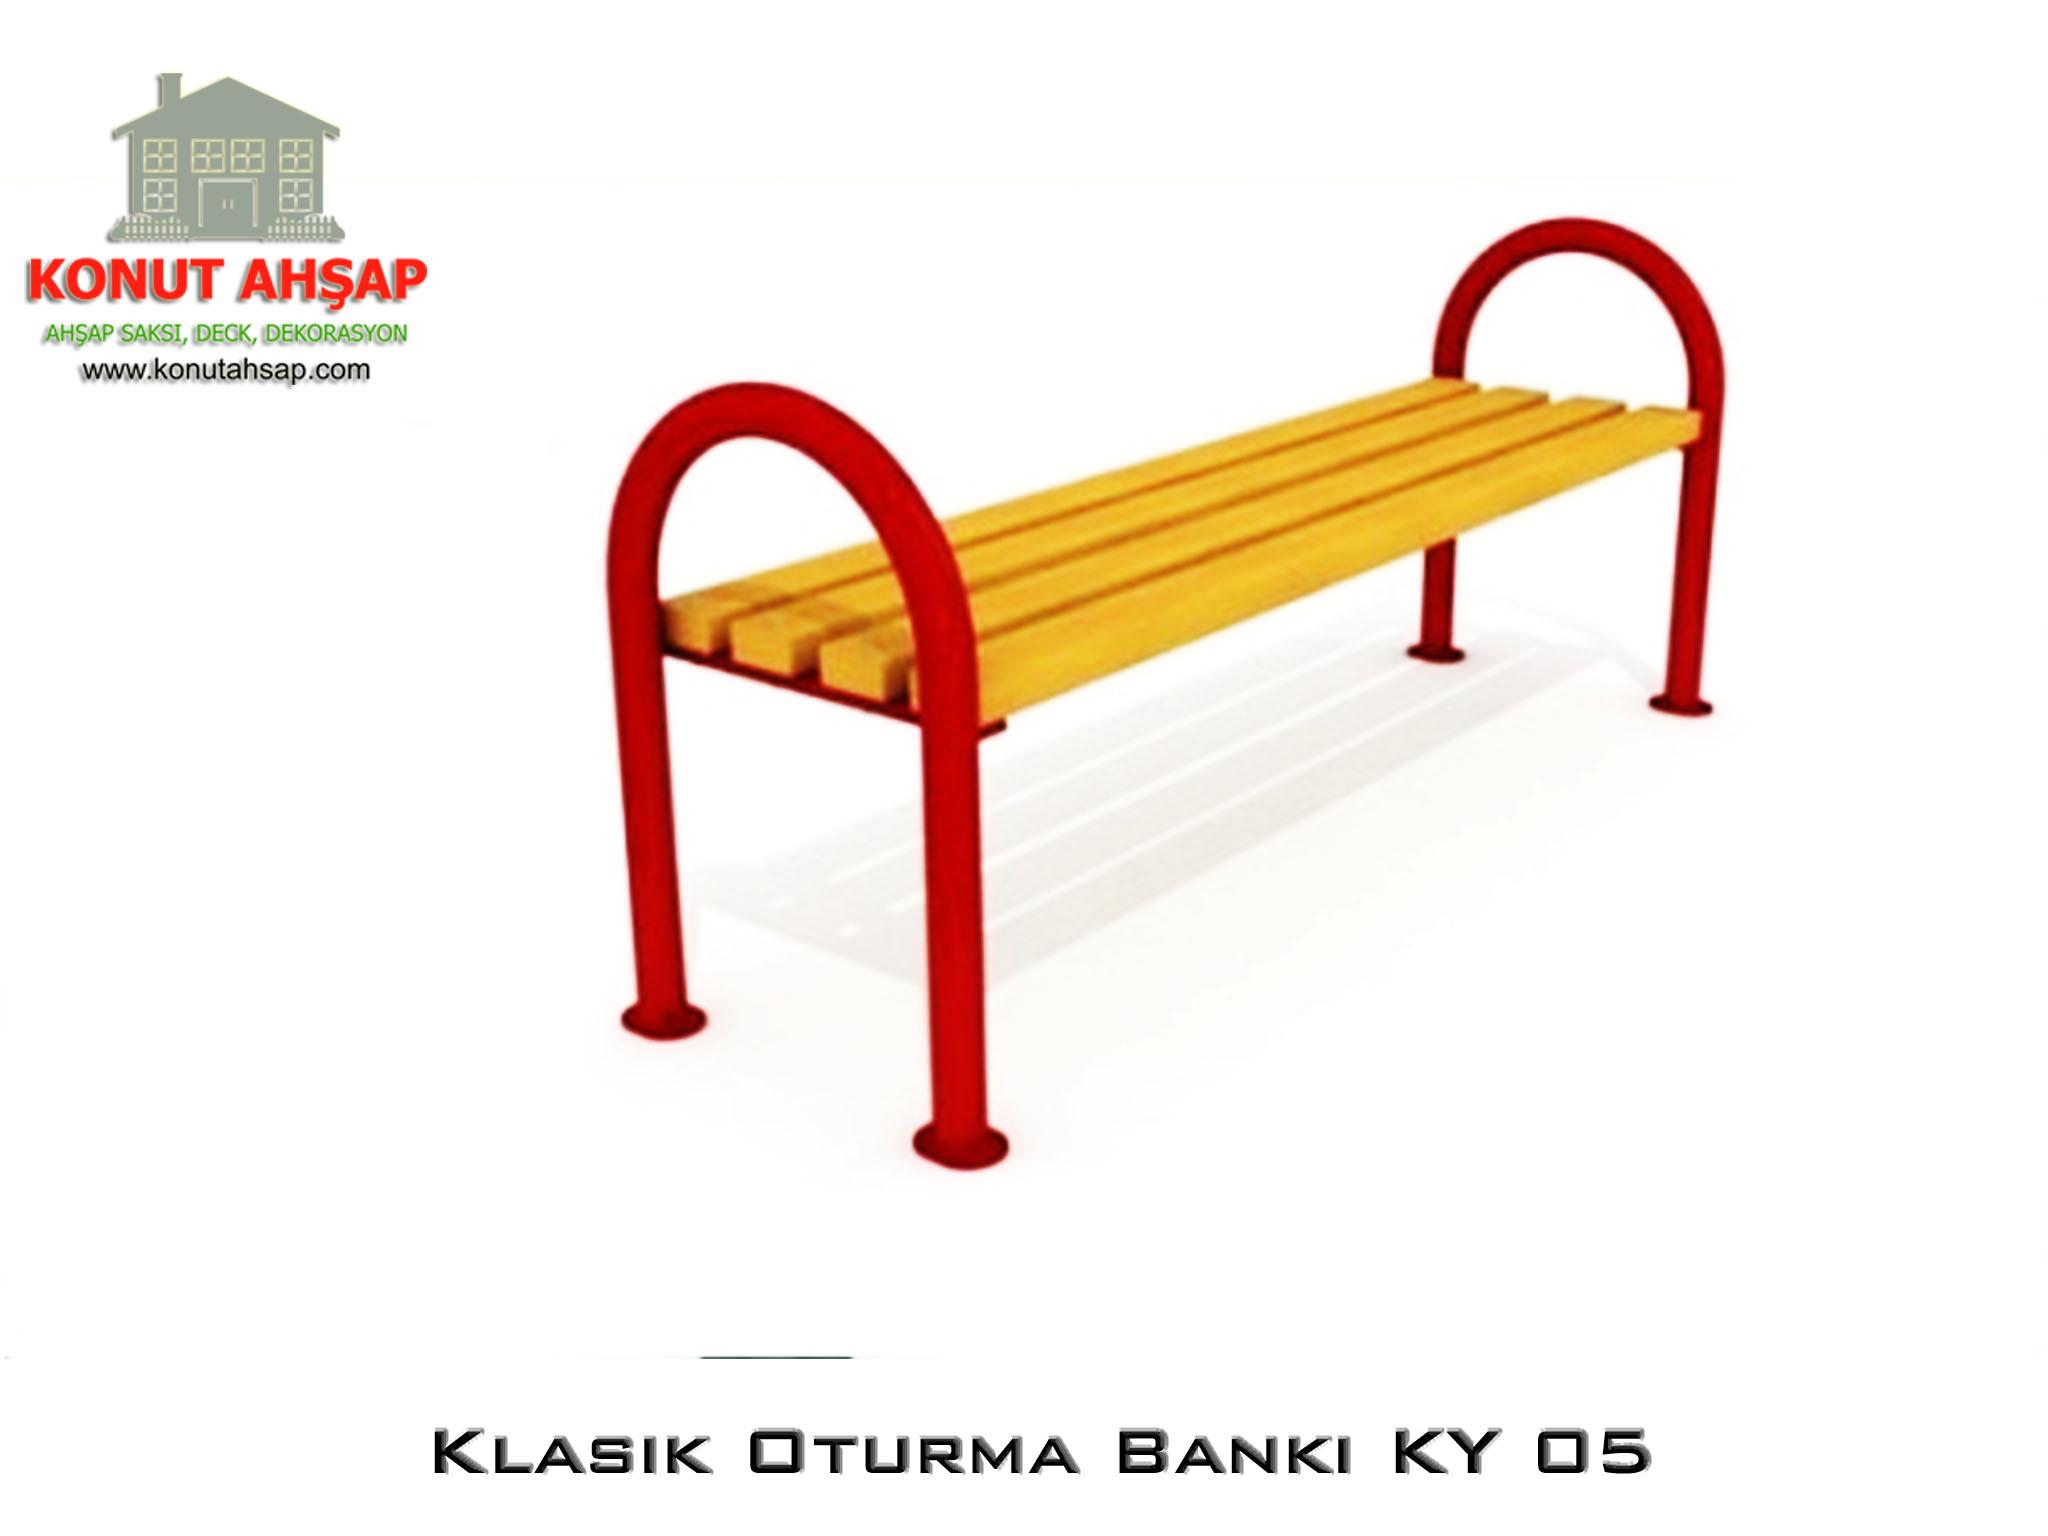 Klasik Oturma Bankı KY 05